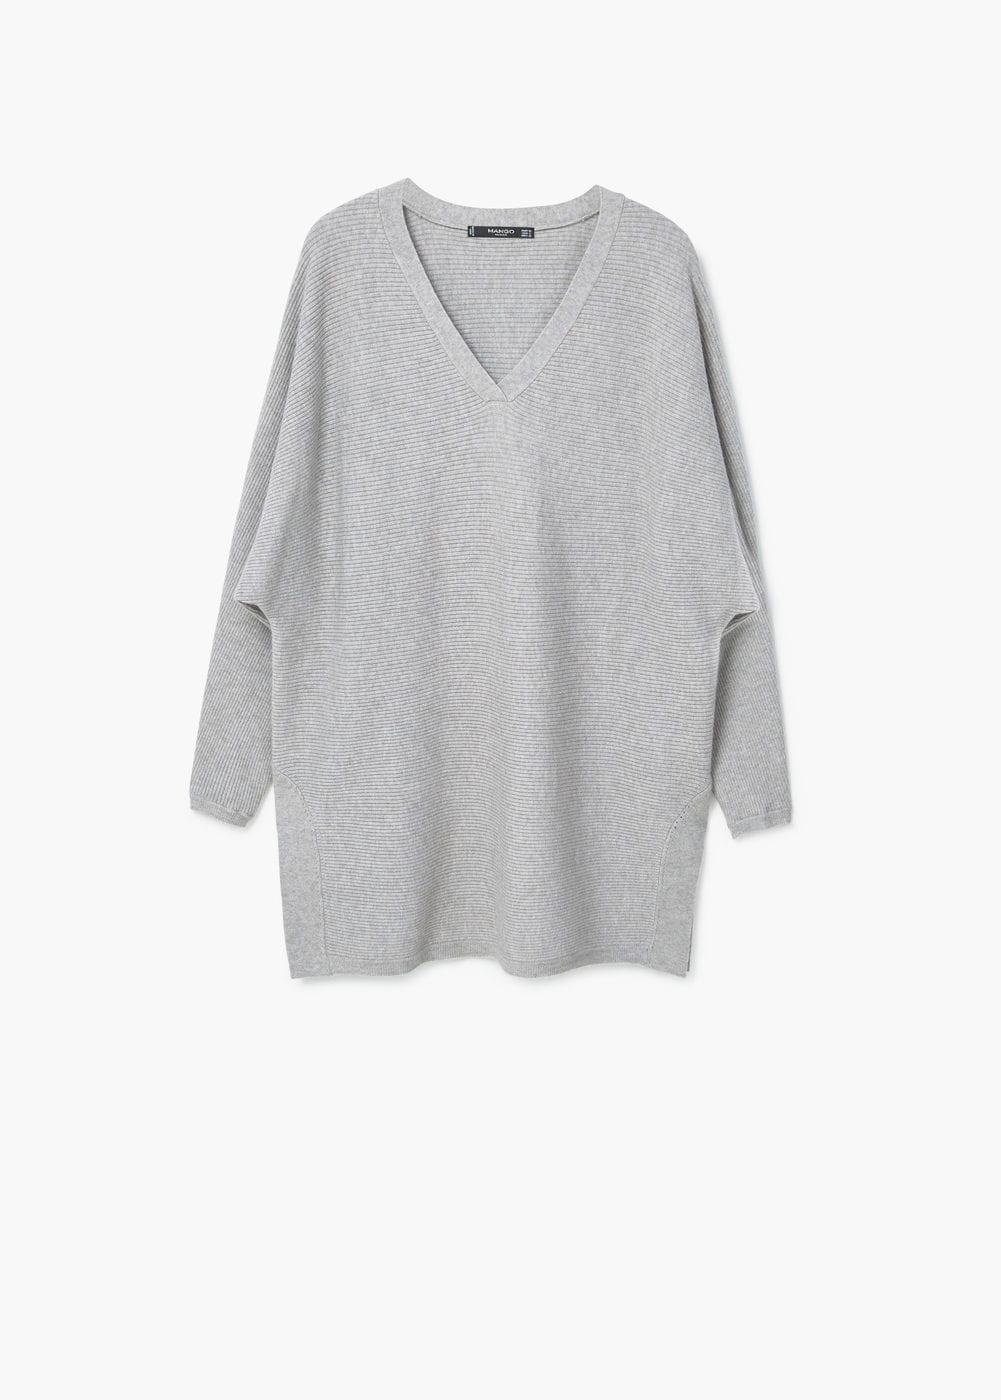 Mango Ribbed Sweater $49.99